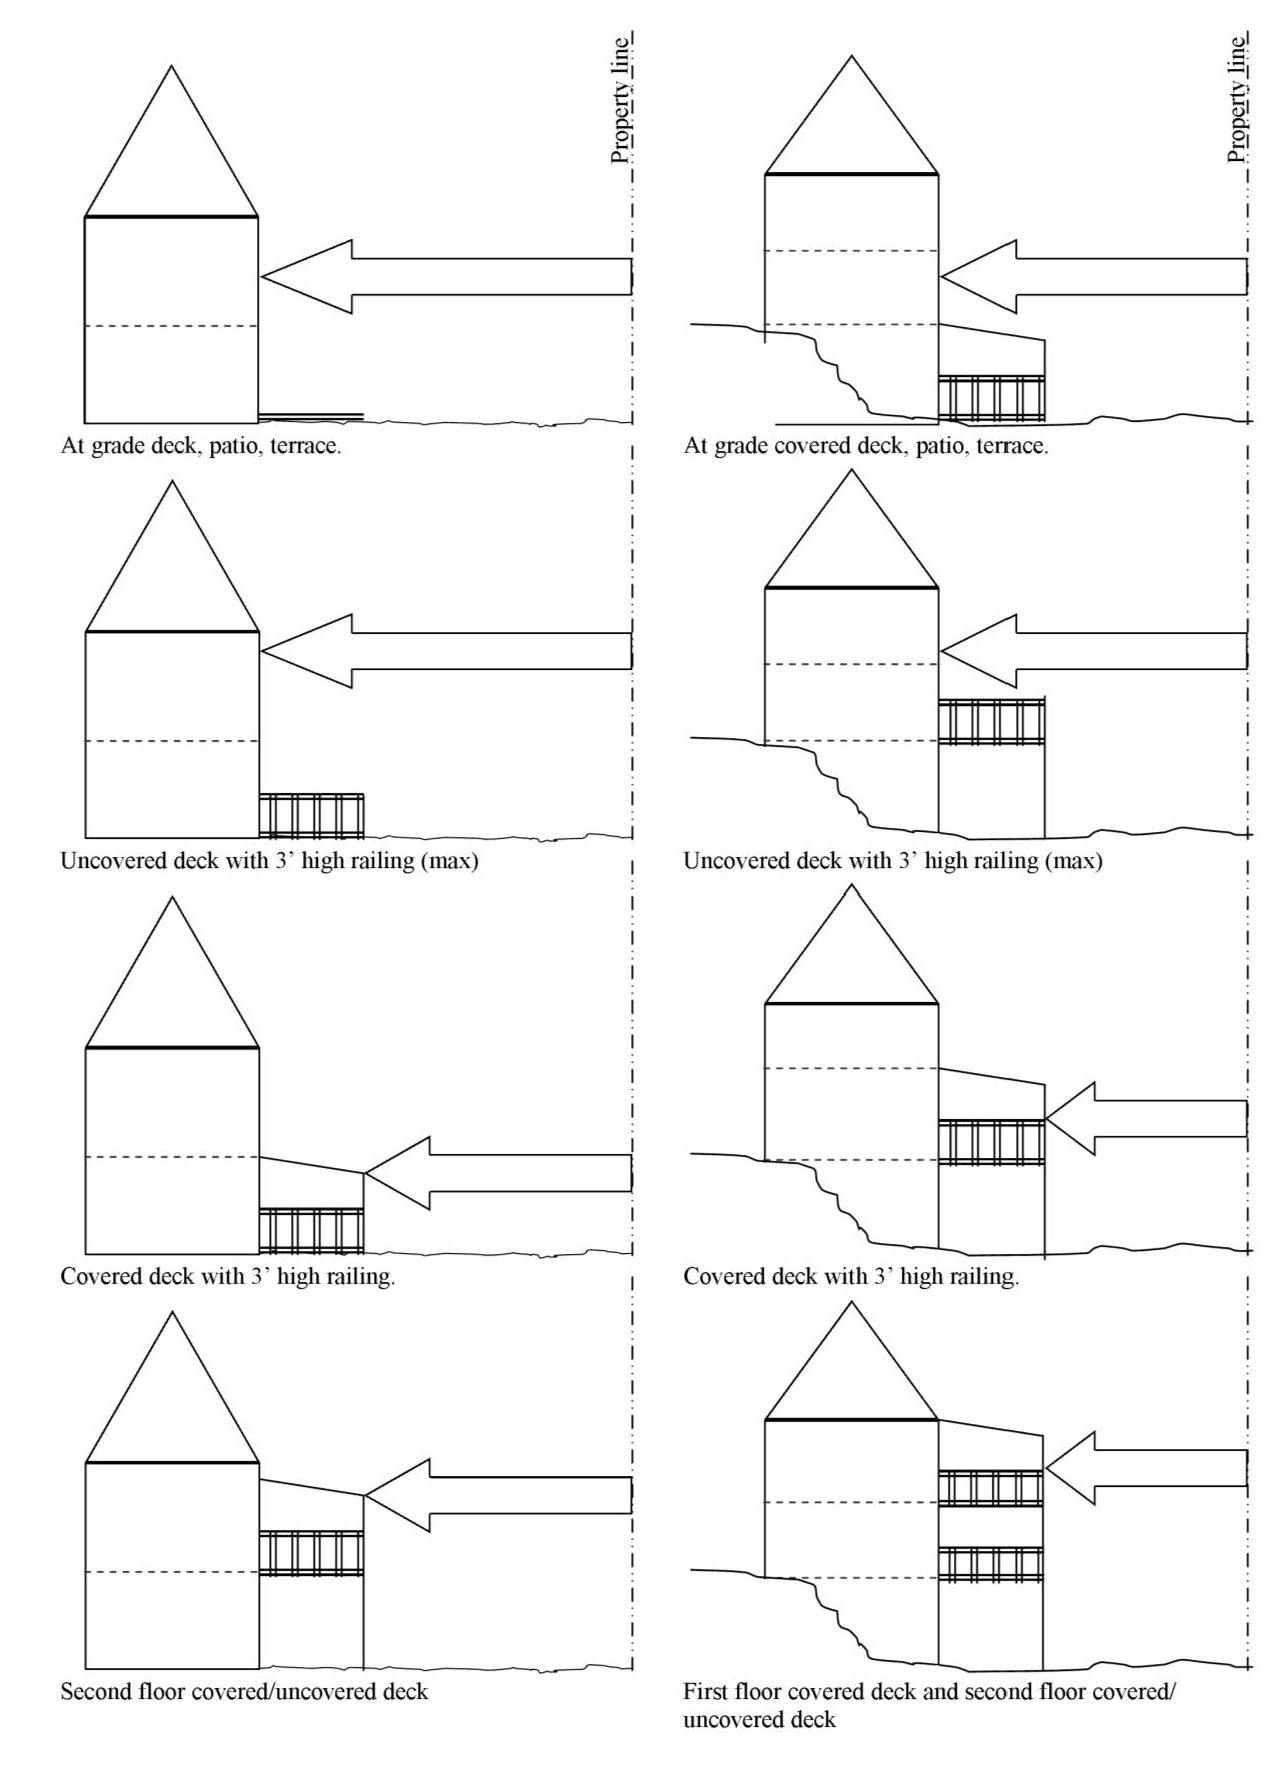 Dual Alternator Belt Diagram As Well Rv Trailer Battery Wiring Diagram